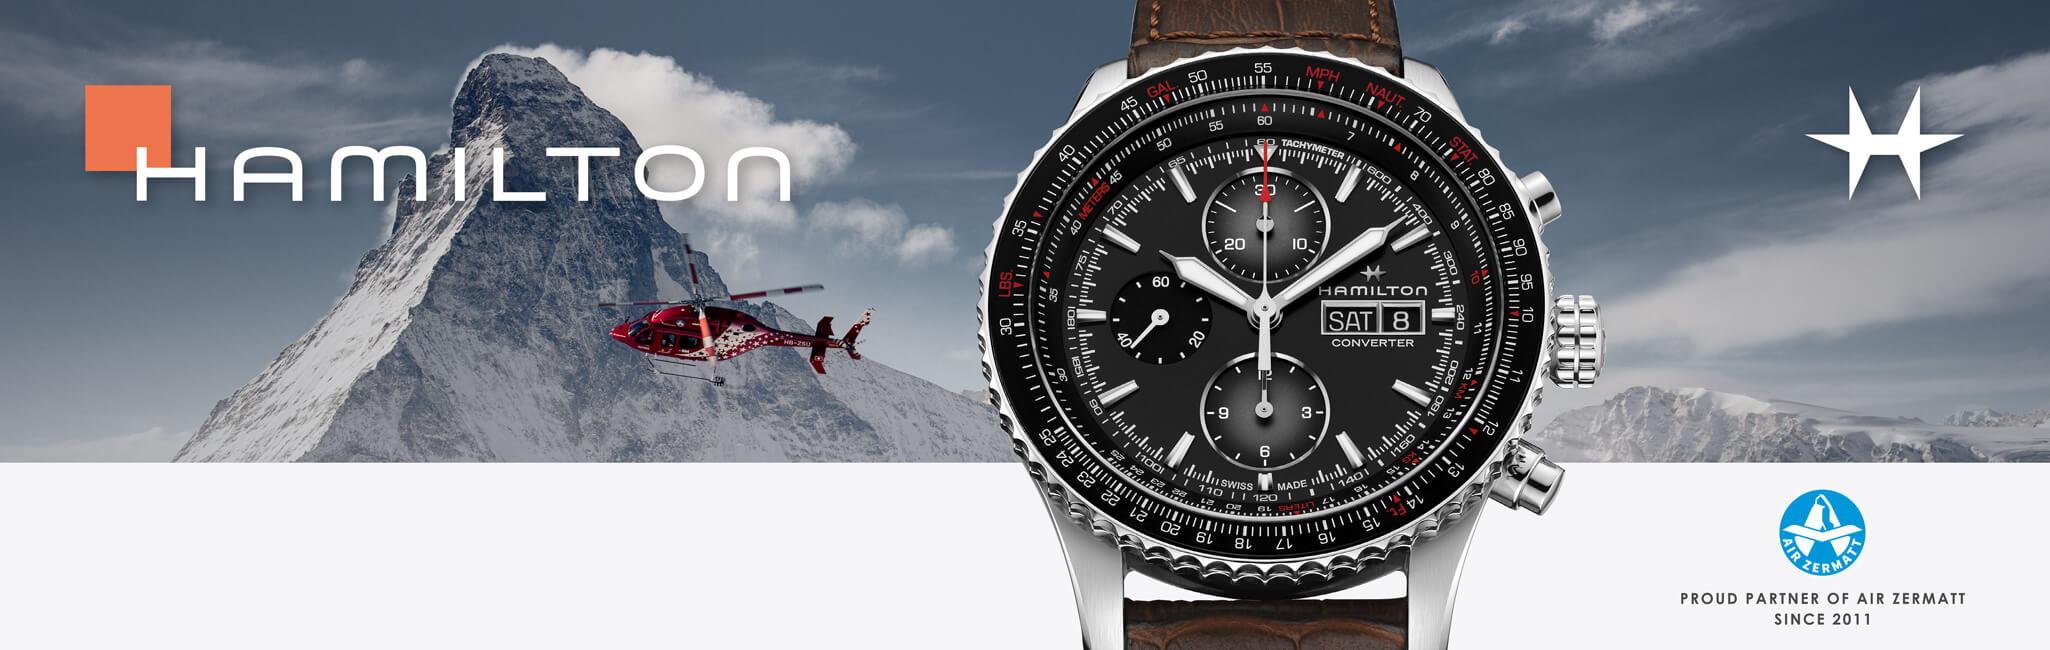 Hamilton Uhren Online Shop